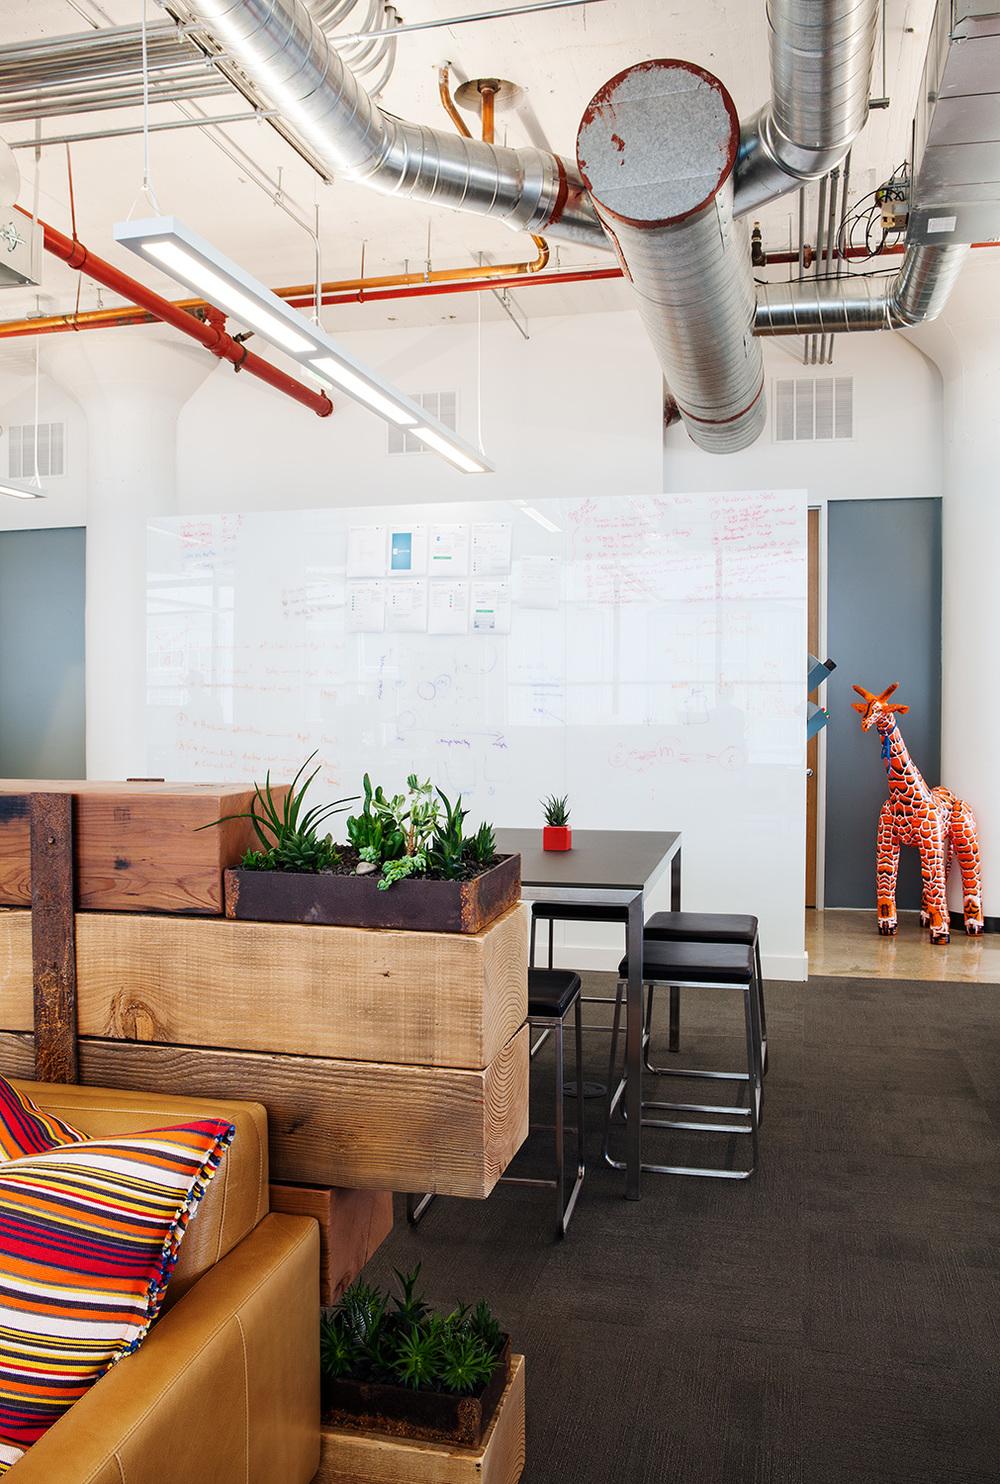 Janel Holiday Interior Design Middle Work Area.jpg